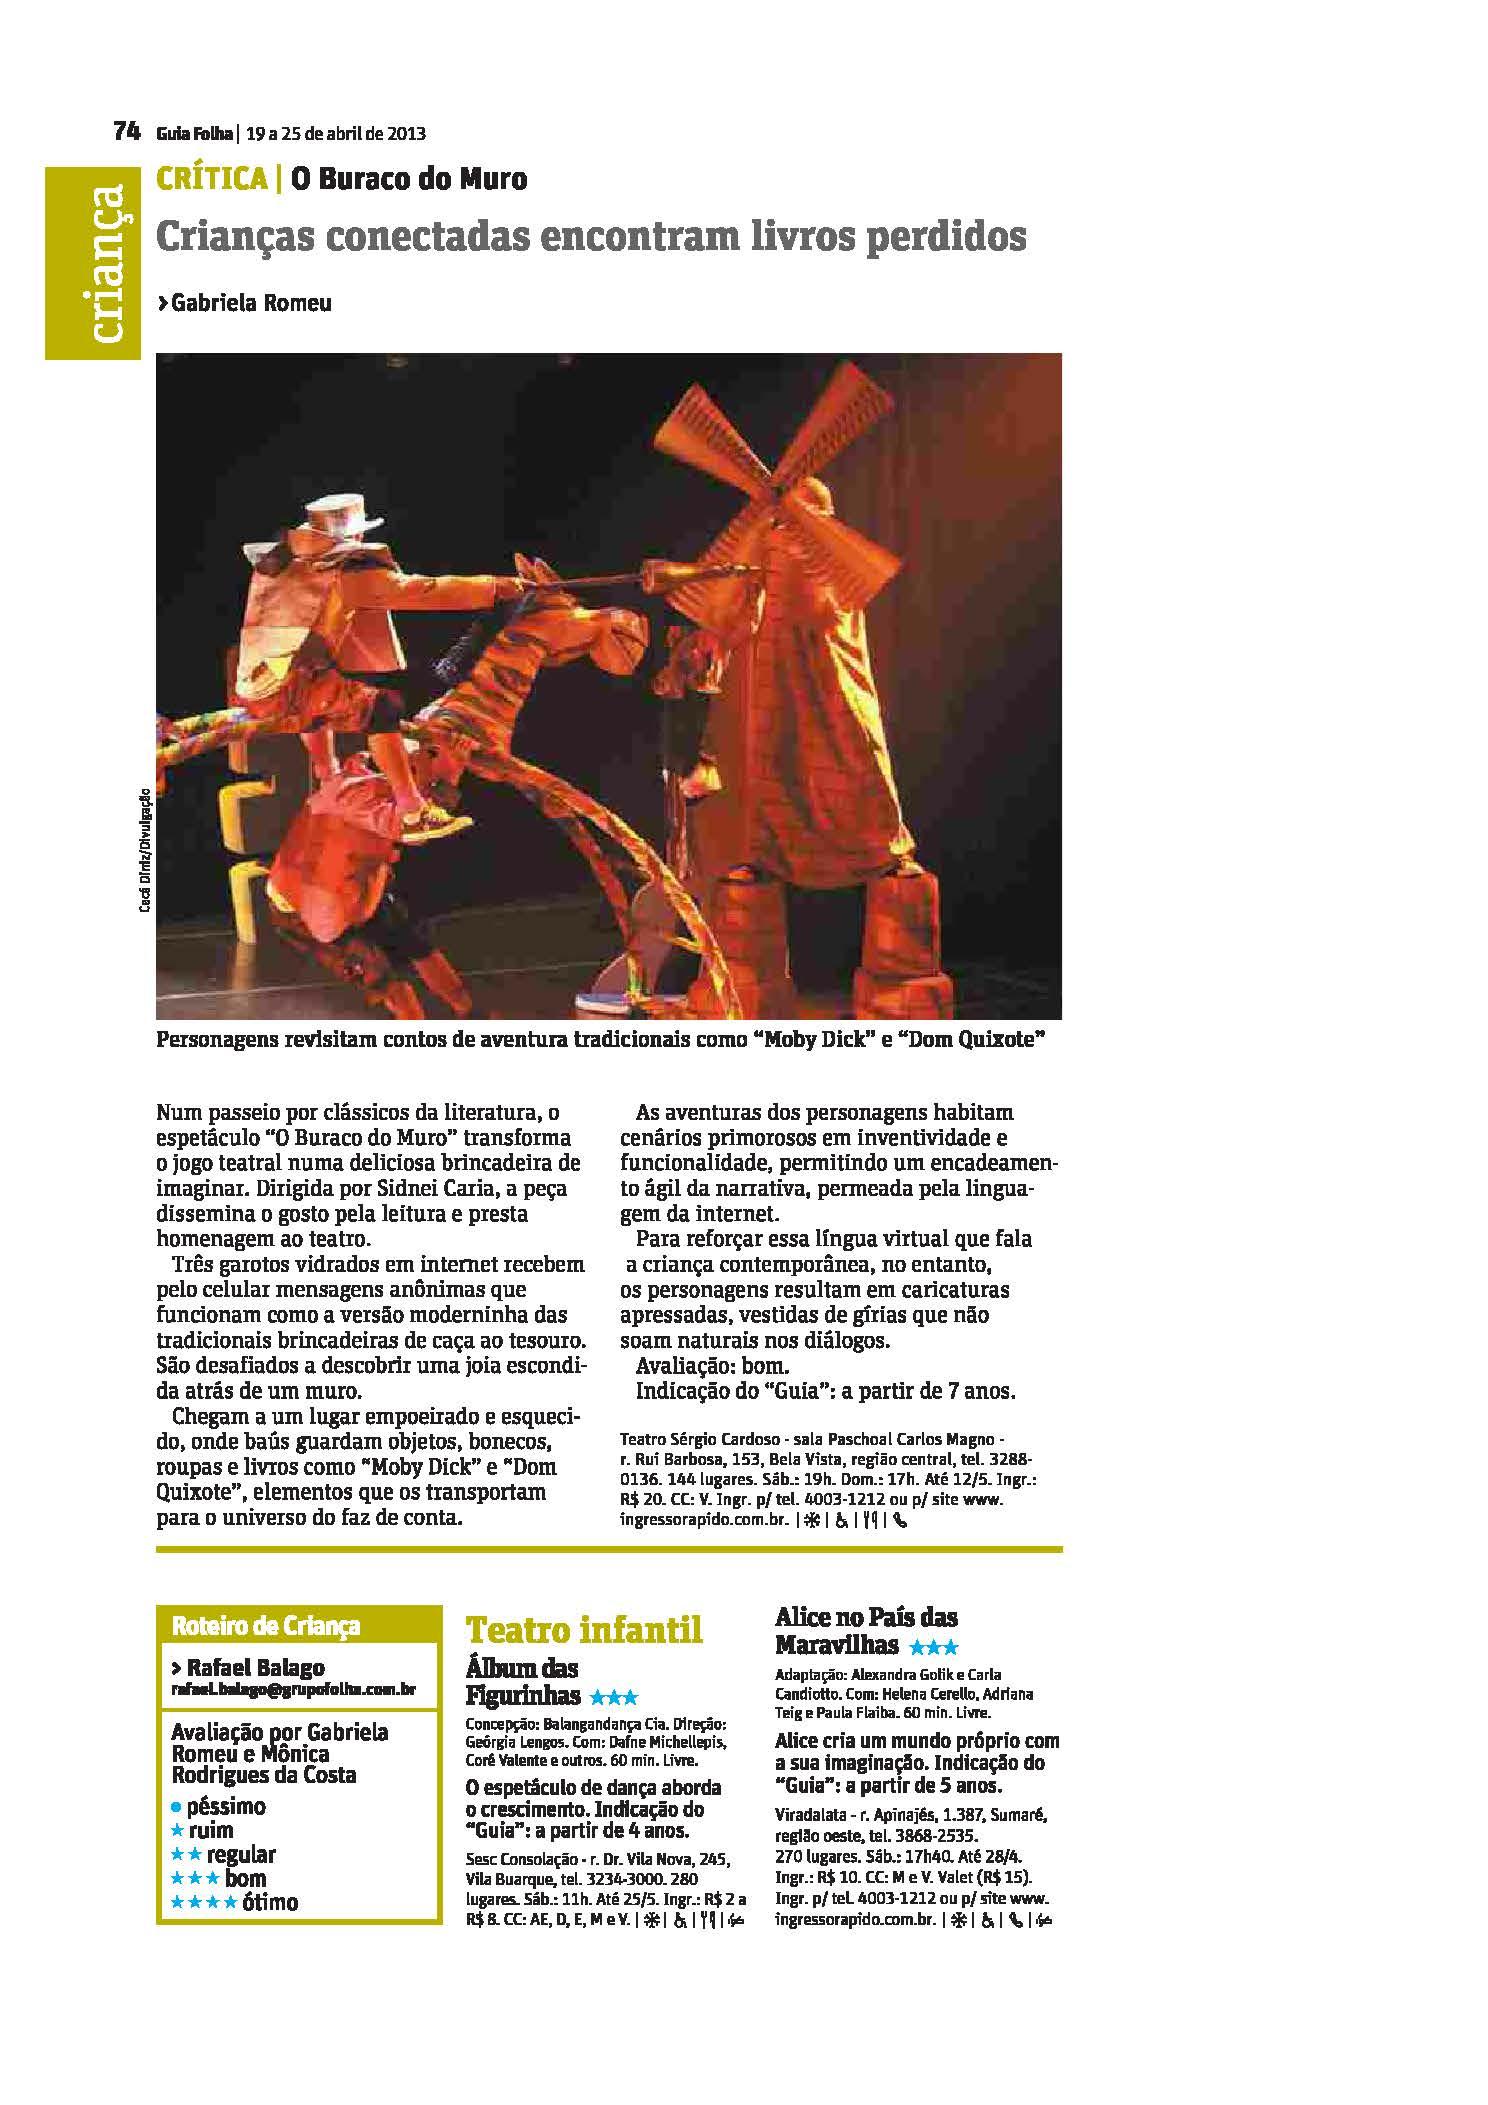 Guia da Folha SP, 19-04-2013